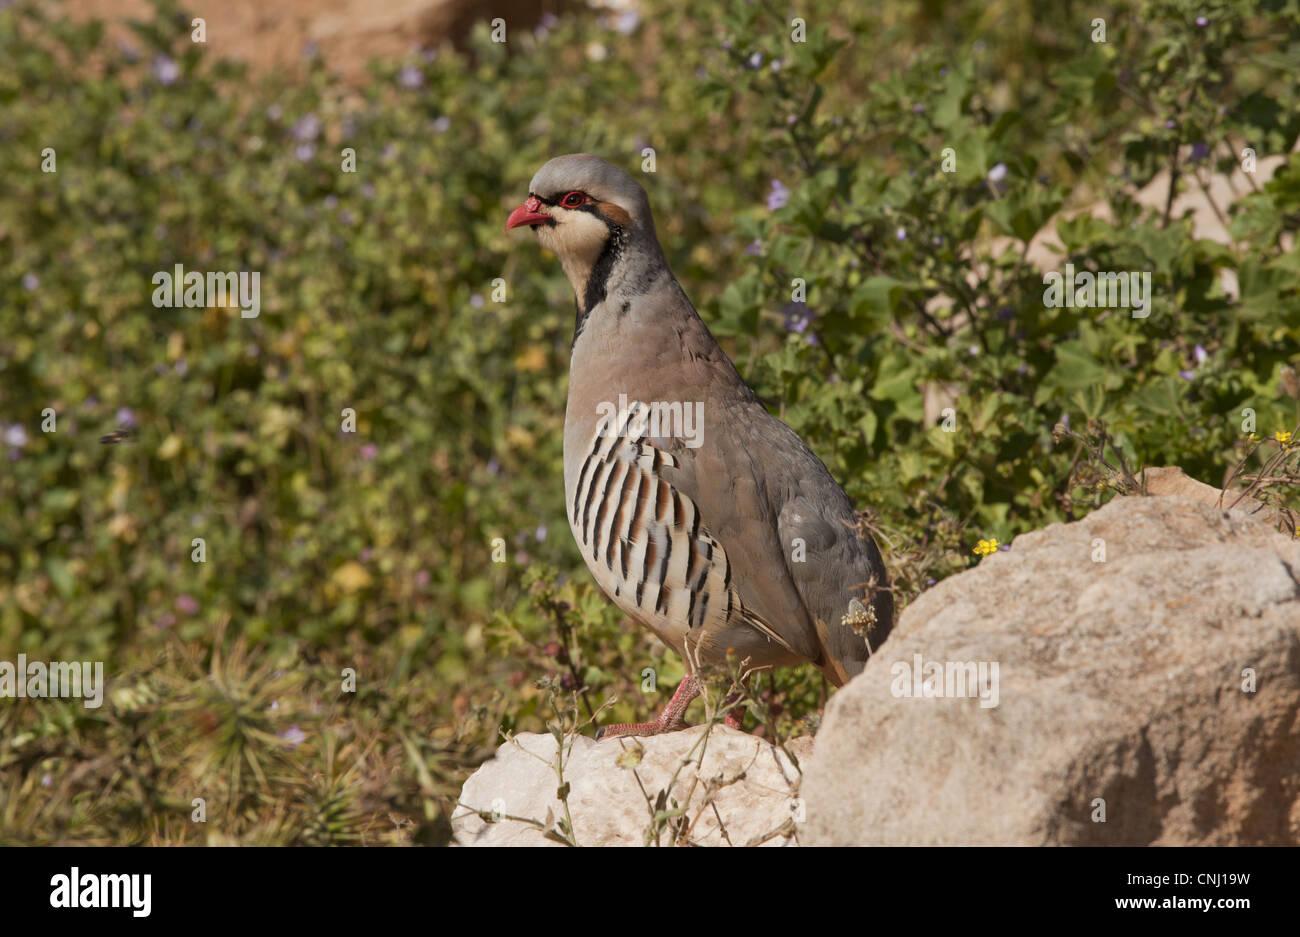 Chukar Partridge (Alectoris chukar) adult male, standing on